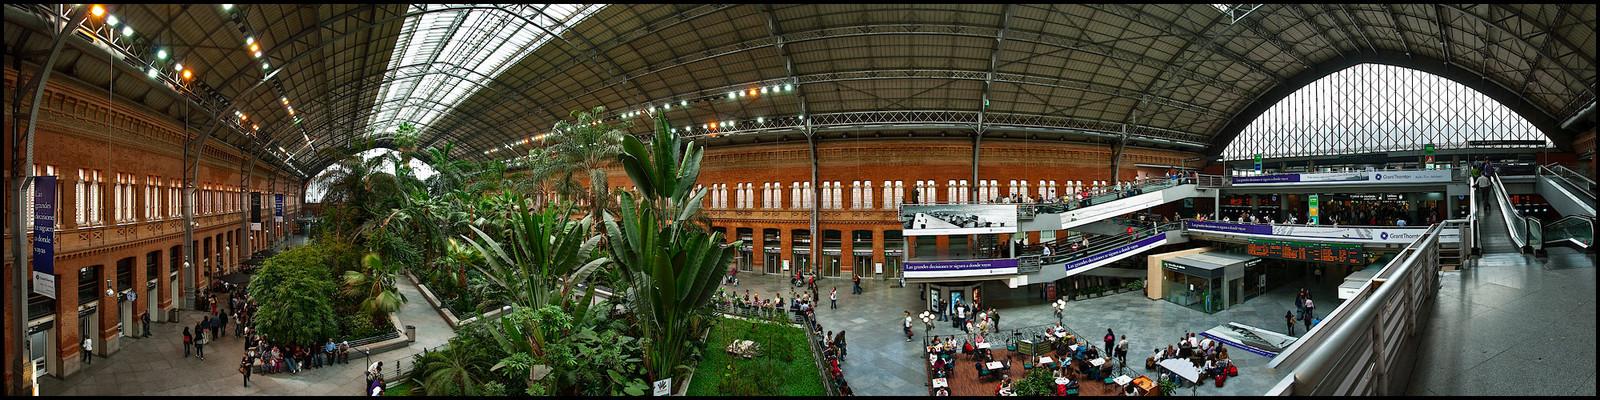 Atocha Bahnhof, Madrid #2